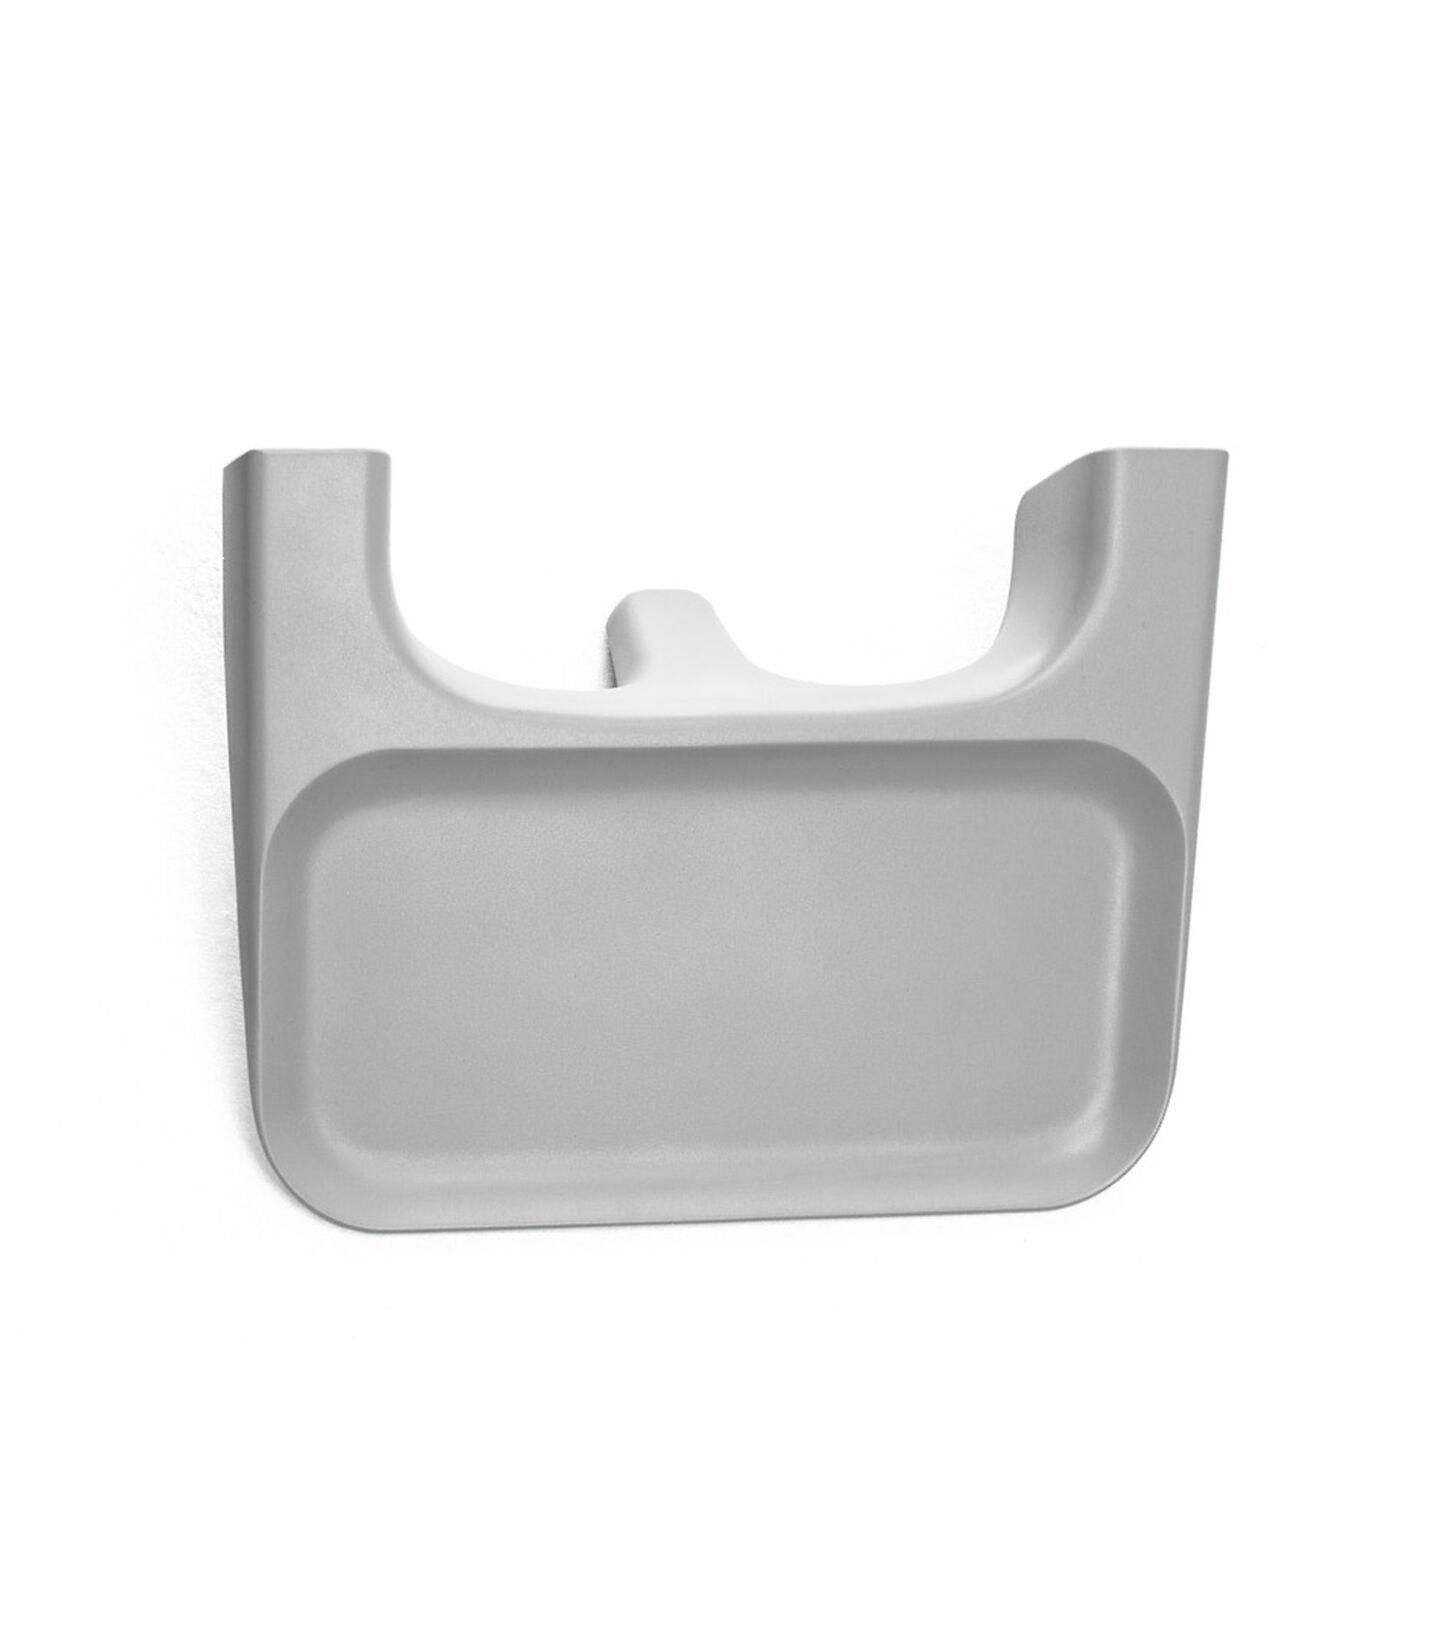 Stokke® Clikk™ Tray - Cloud Grey, Cloud Grey, mainview view 1